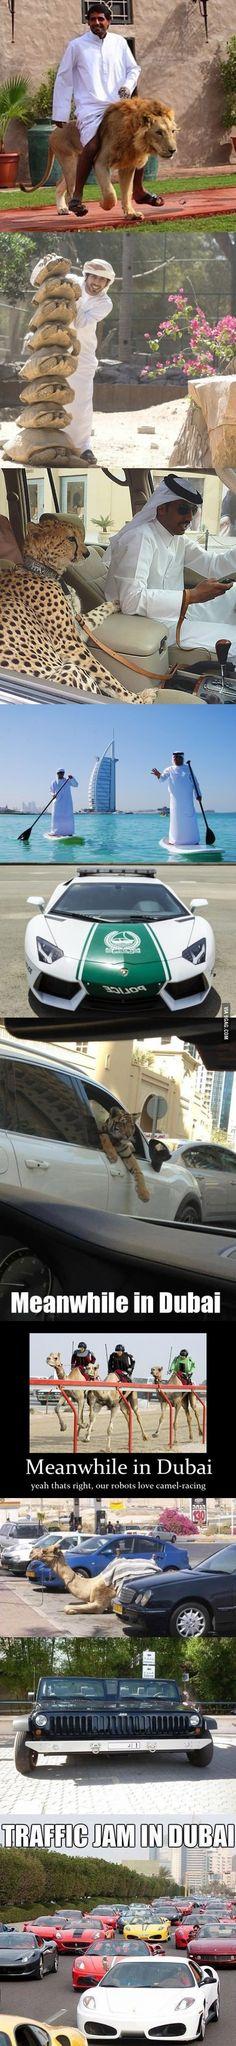 Meanwhile in Dubai...